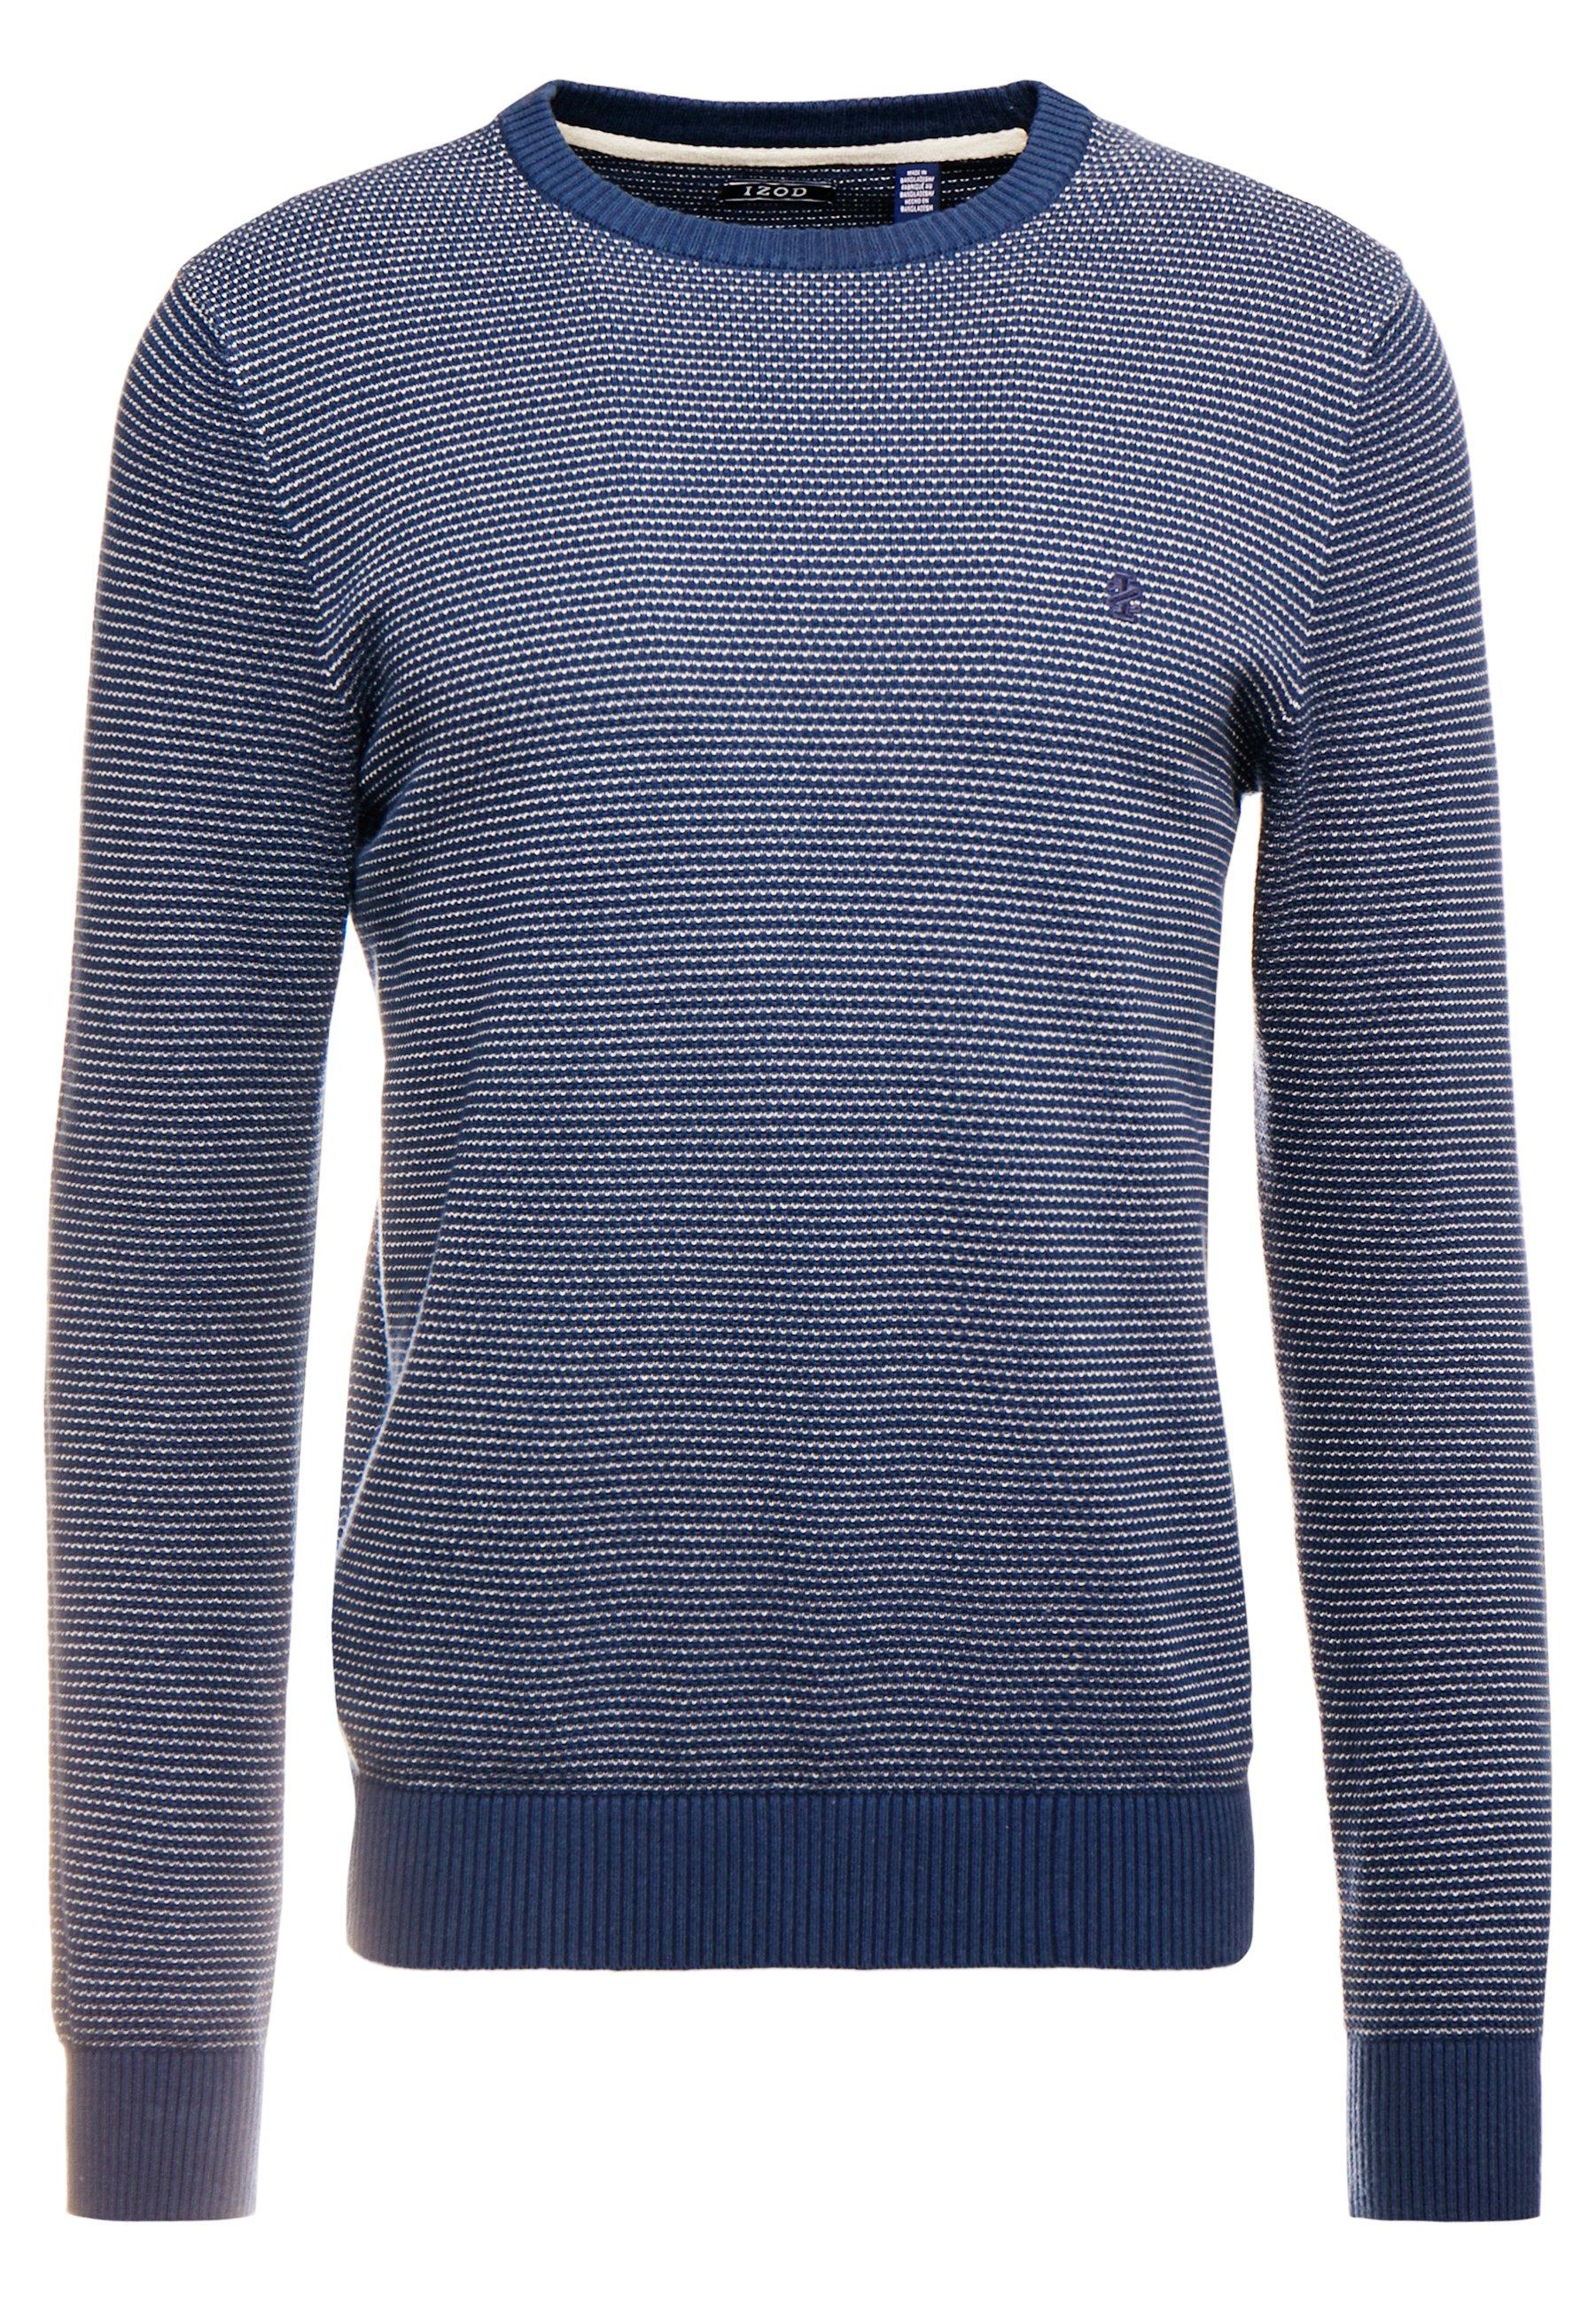 Grey /& Navy Jacquard Crew Neck Sweater